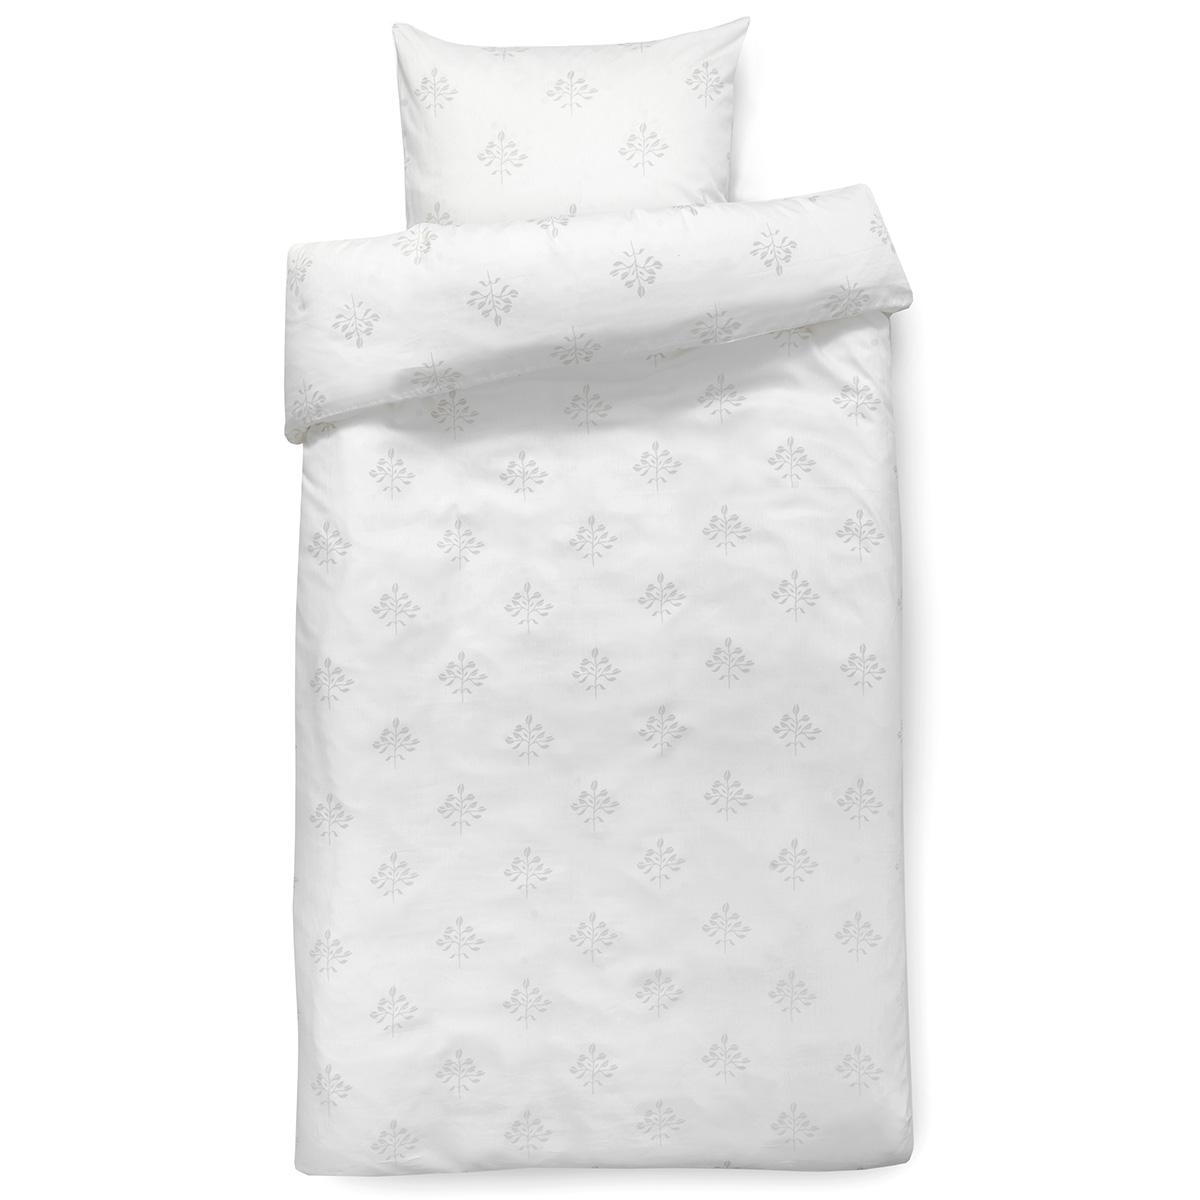 Image of   Isabell Kristensen sengetøj - Hvid og lysegrå